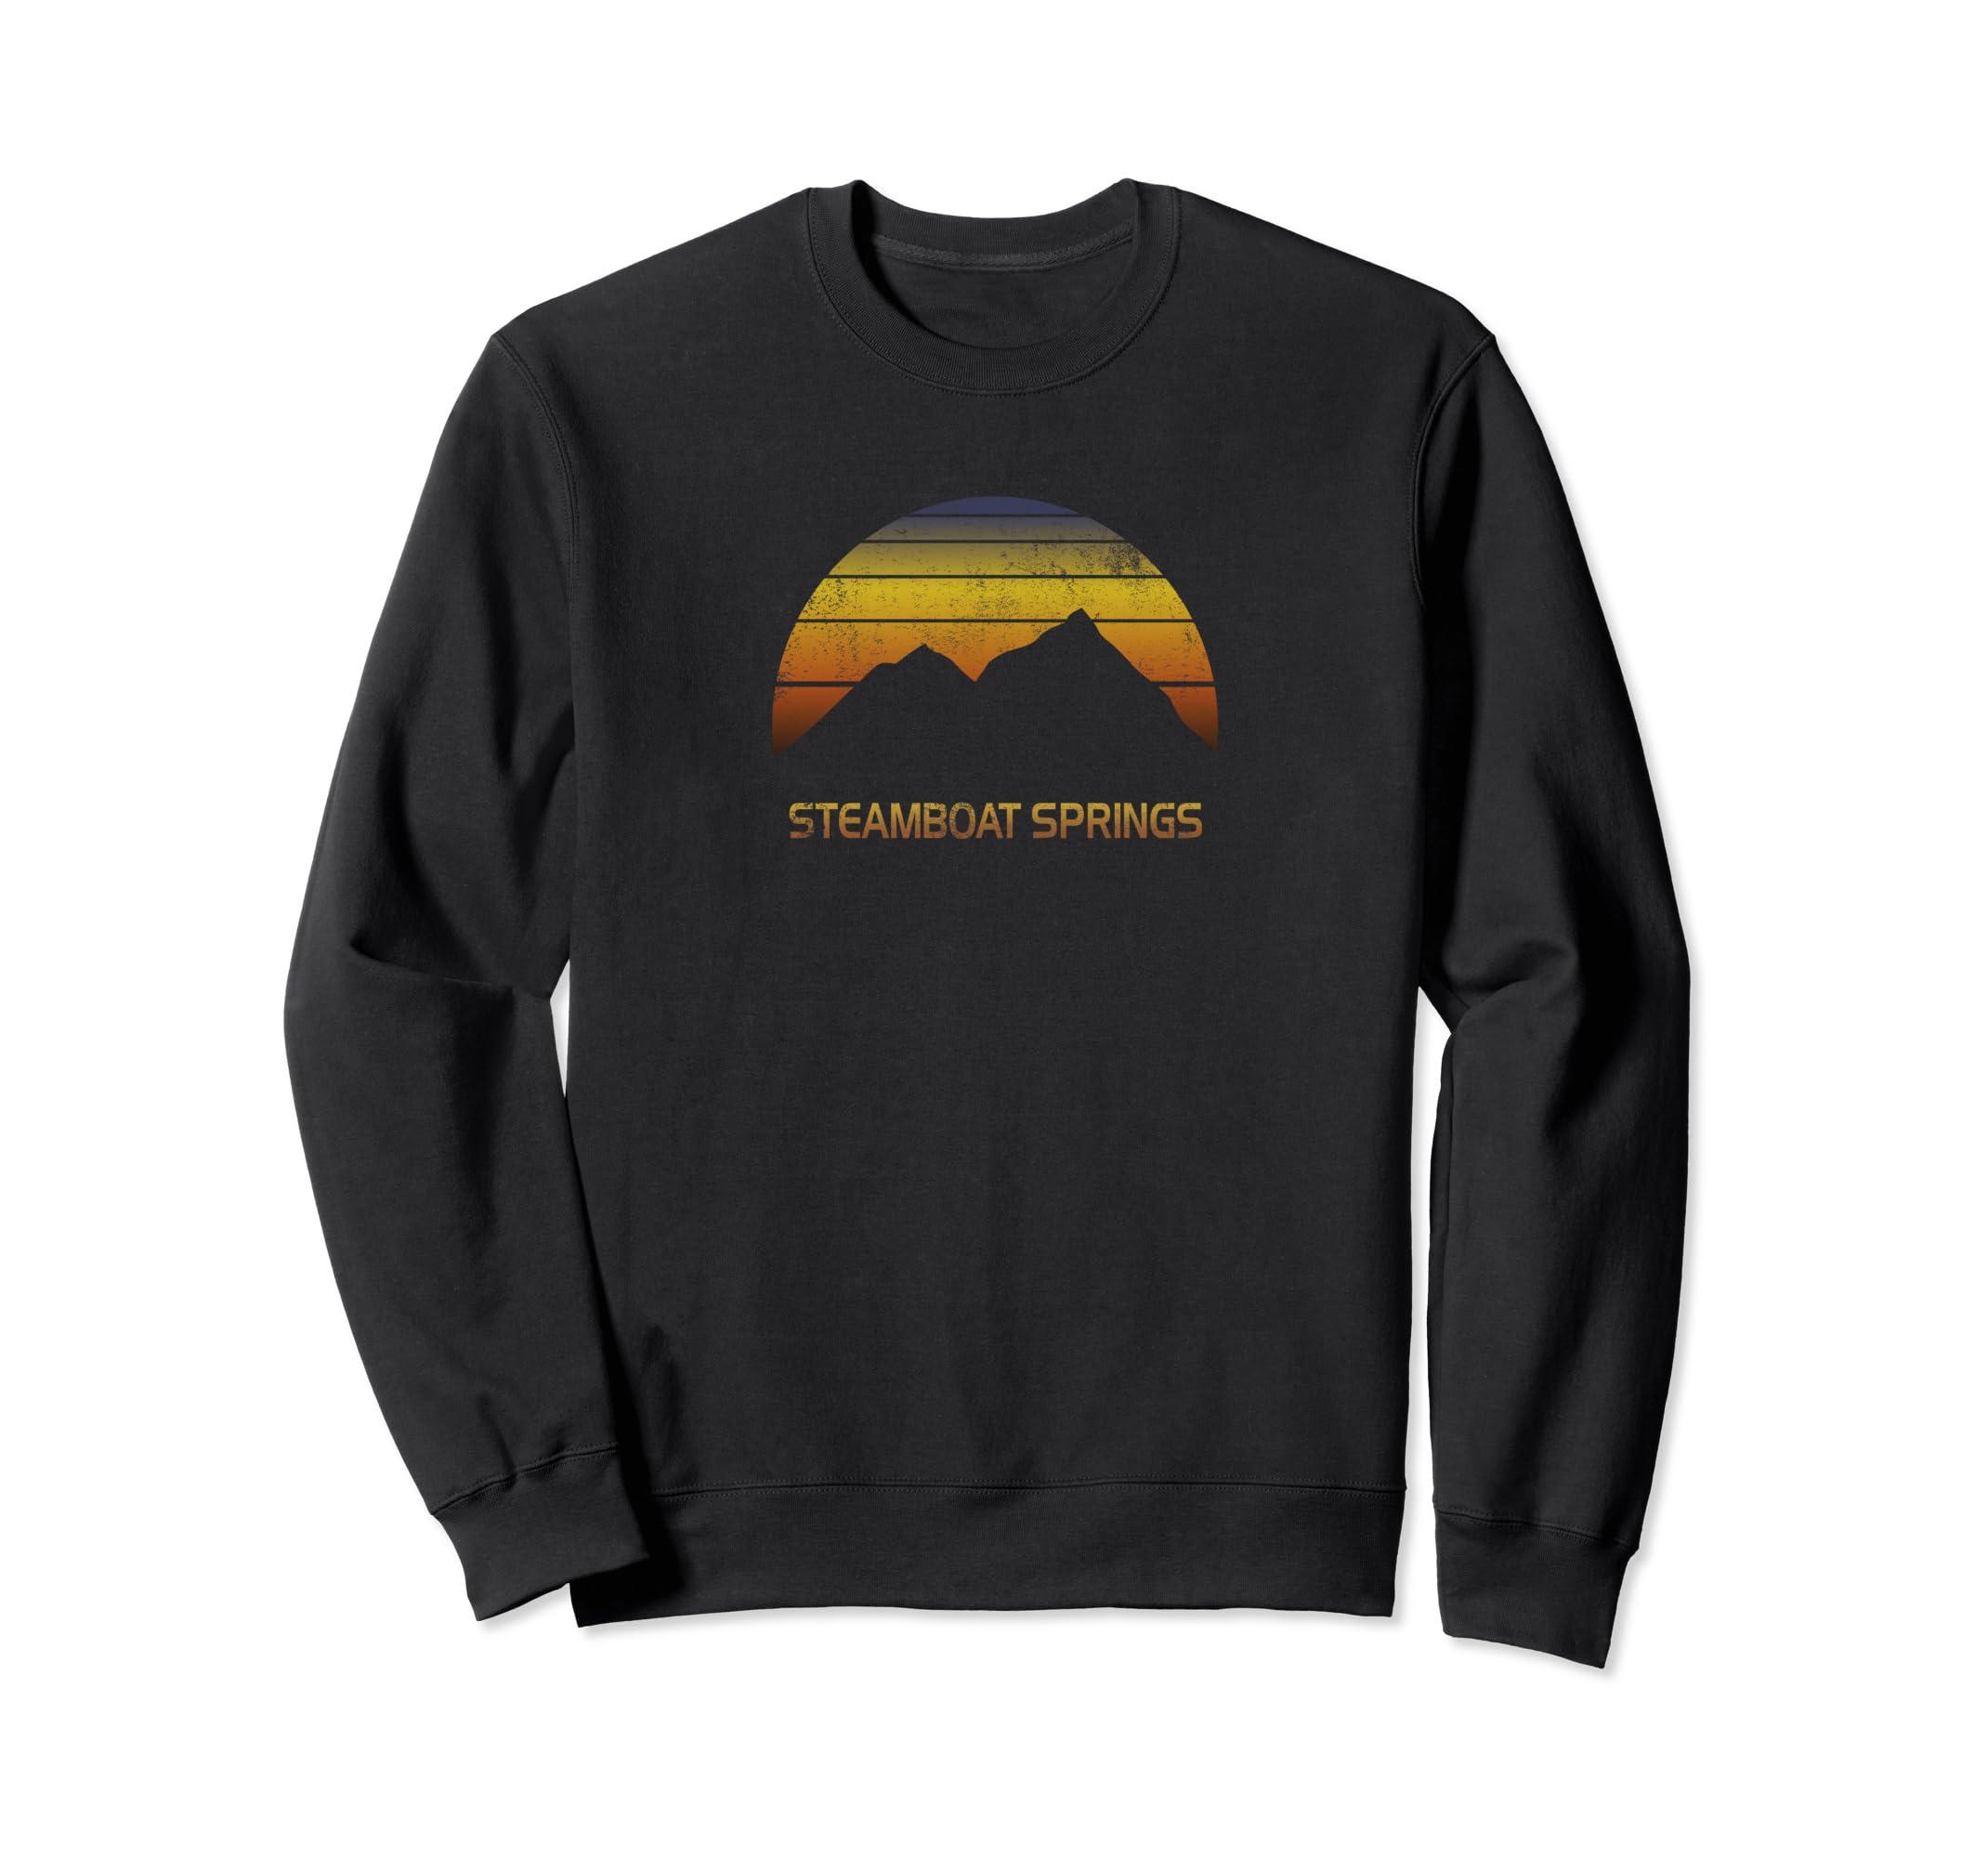 Sweatshirt Steamboat Springs Colorado Ski Snowboard Clothes-Teehay